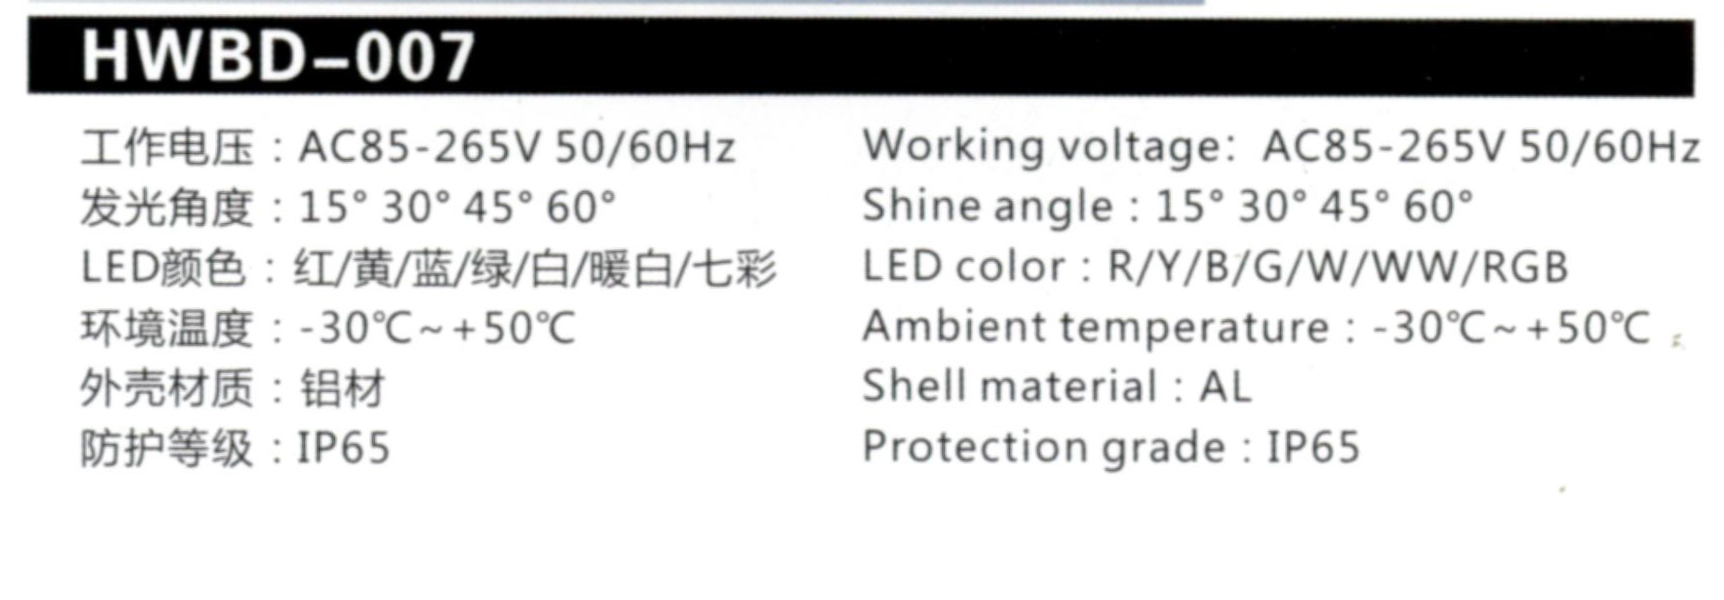 LED户外壁灯Model∶HWBD-007参数.jpg